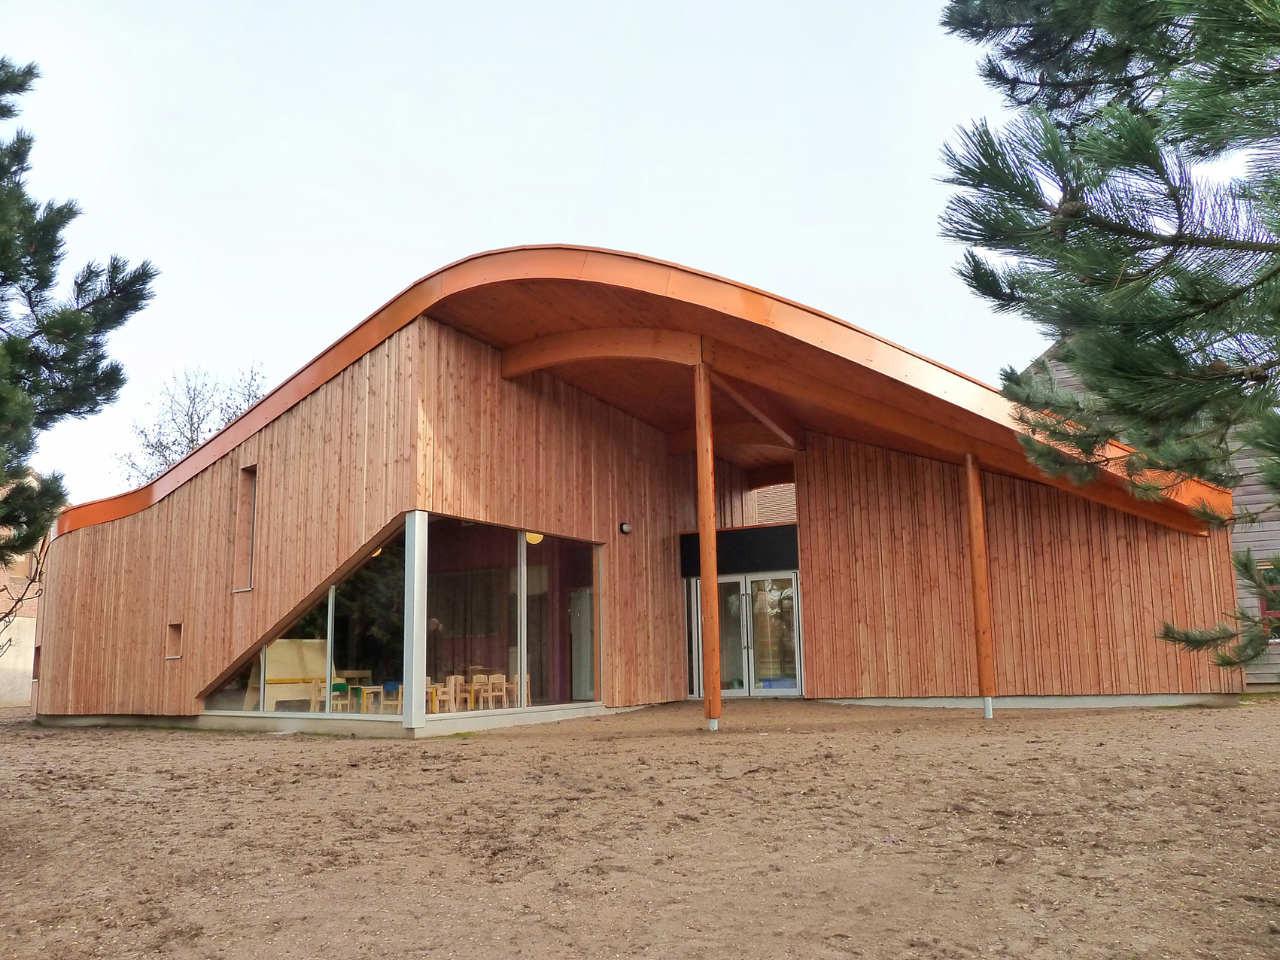 Le Petit Prince Nursery School / AR+TE Architectes, © AR + TE Architectes